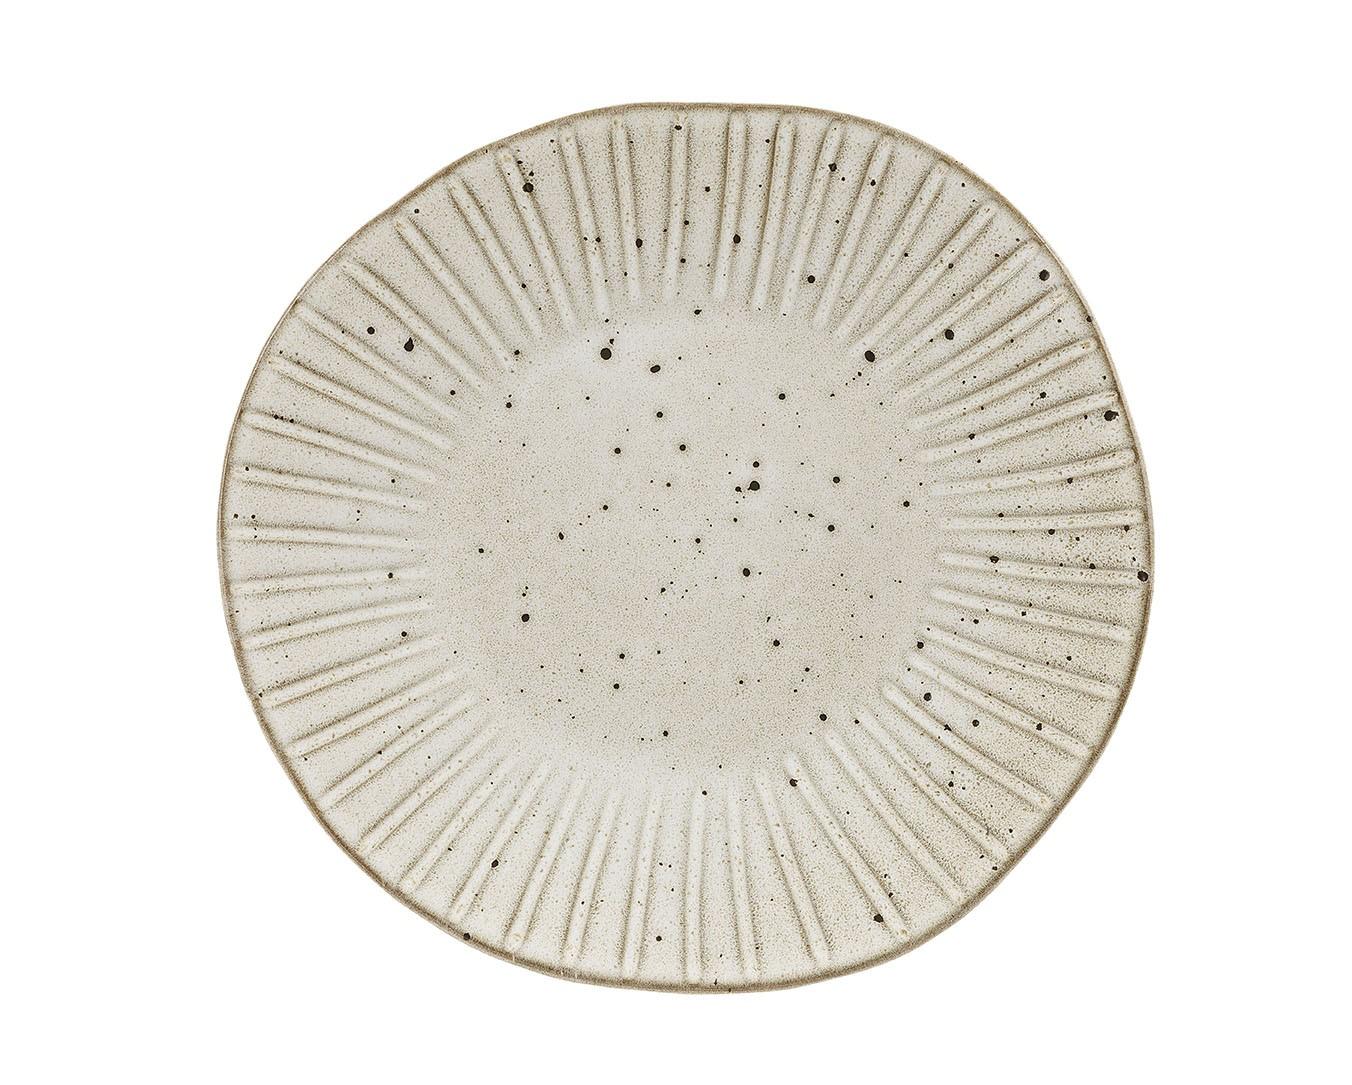 Rustico Impresiones Oyster Cena 28.5cm Plate